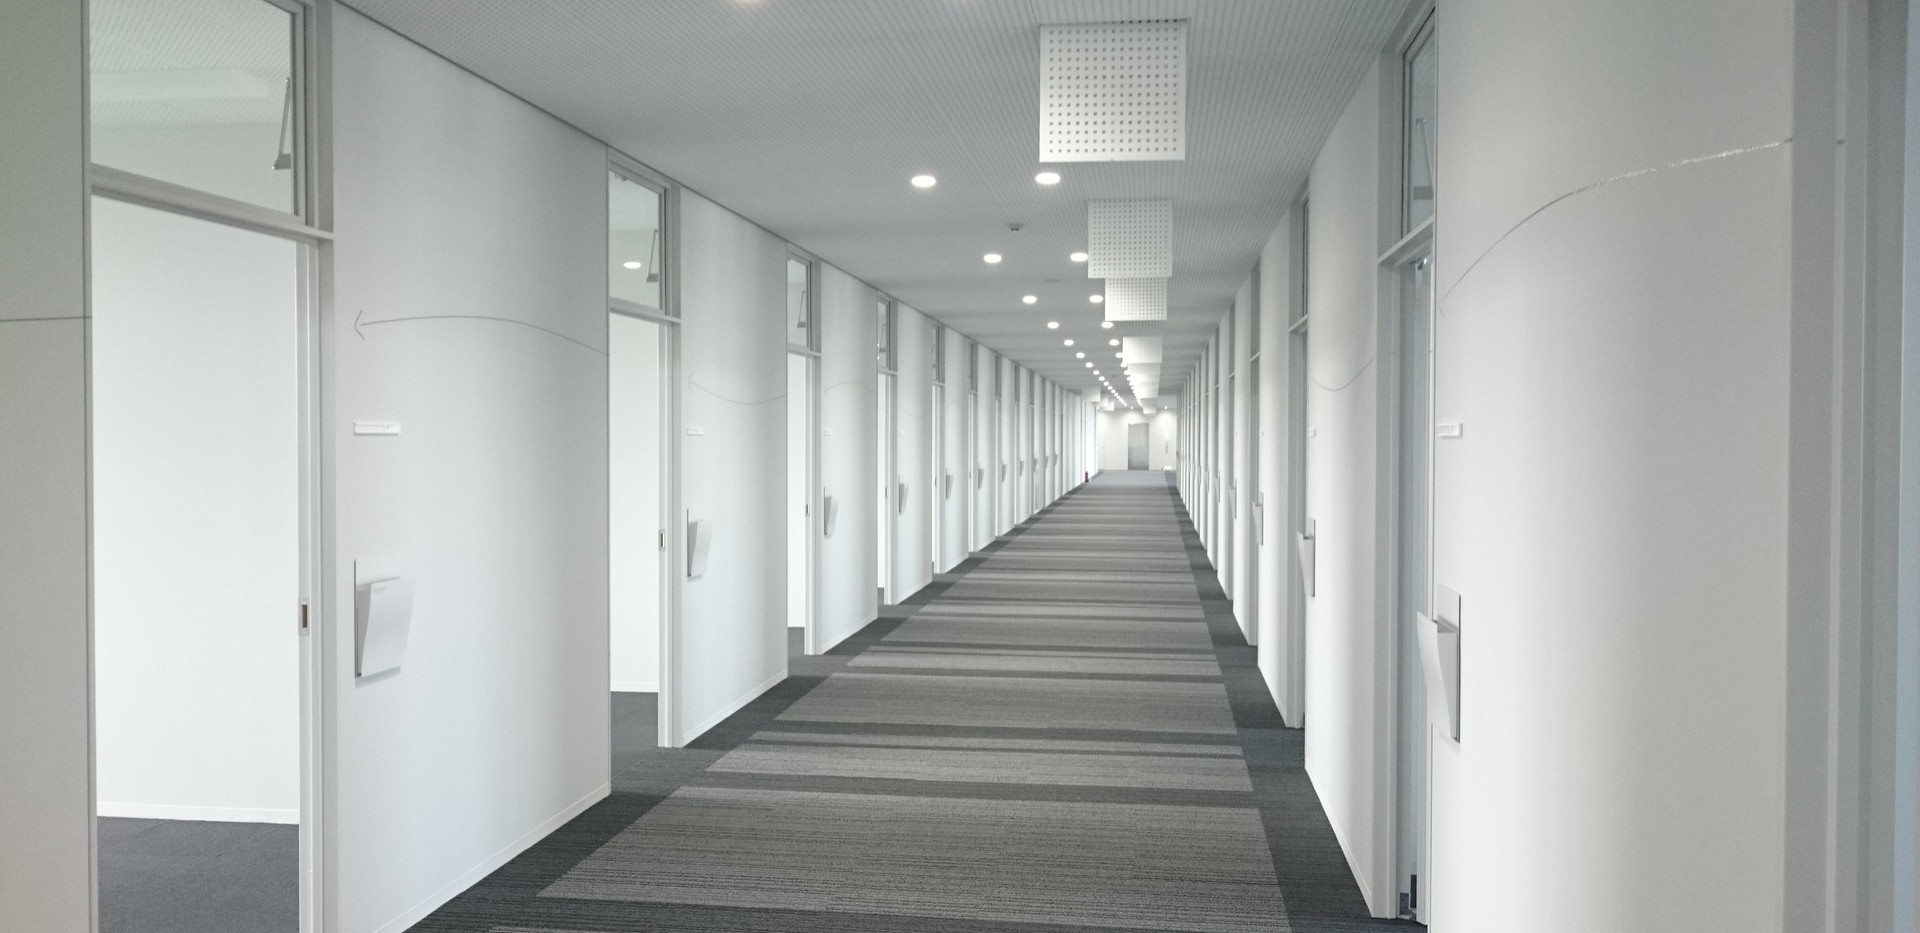 M大学3.jpg